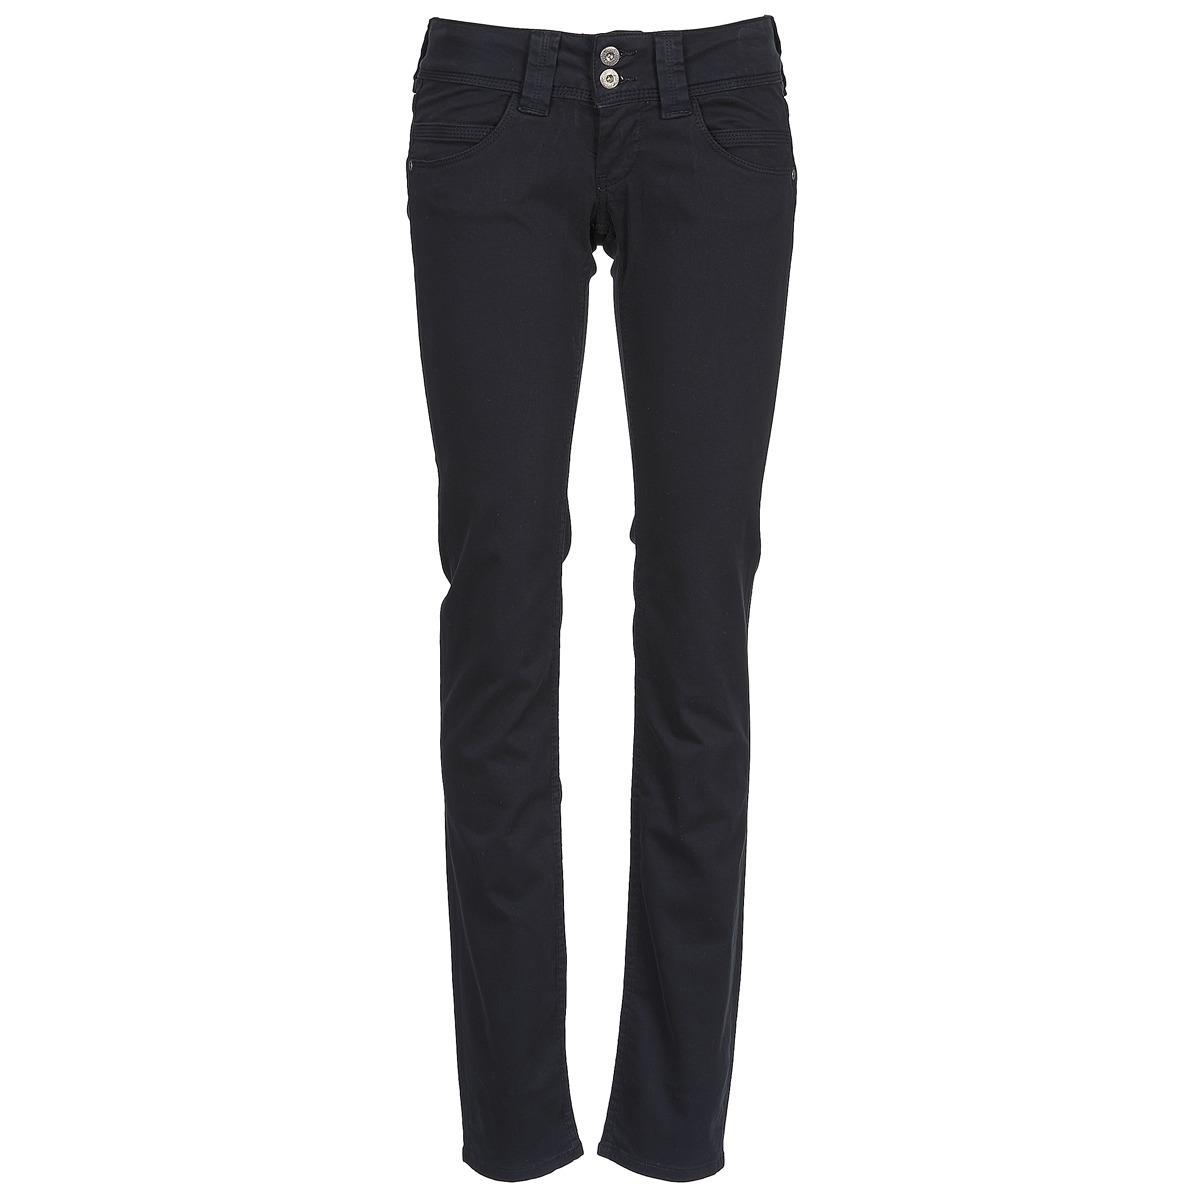 5 pocket trousers pepe jeans venus black free delivery. Black Bedroom Furniture Sets. Home Design Ideas